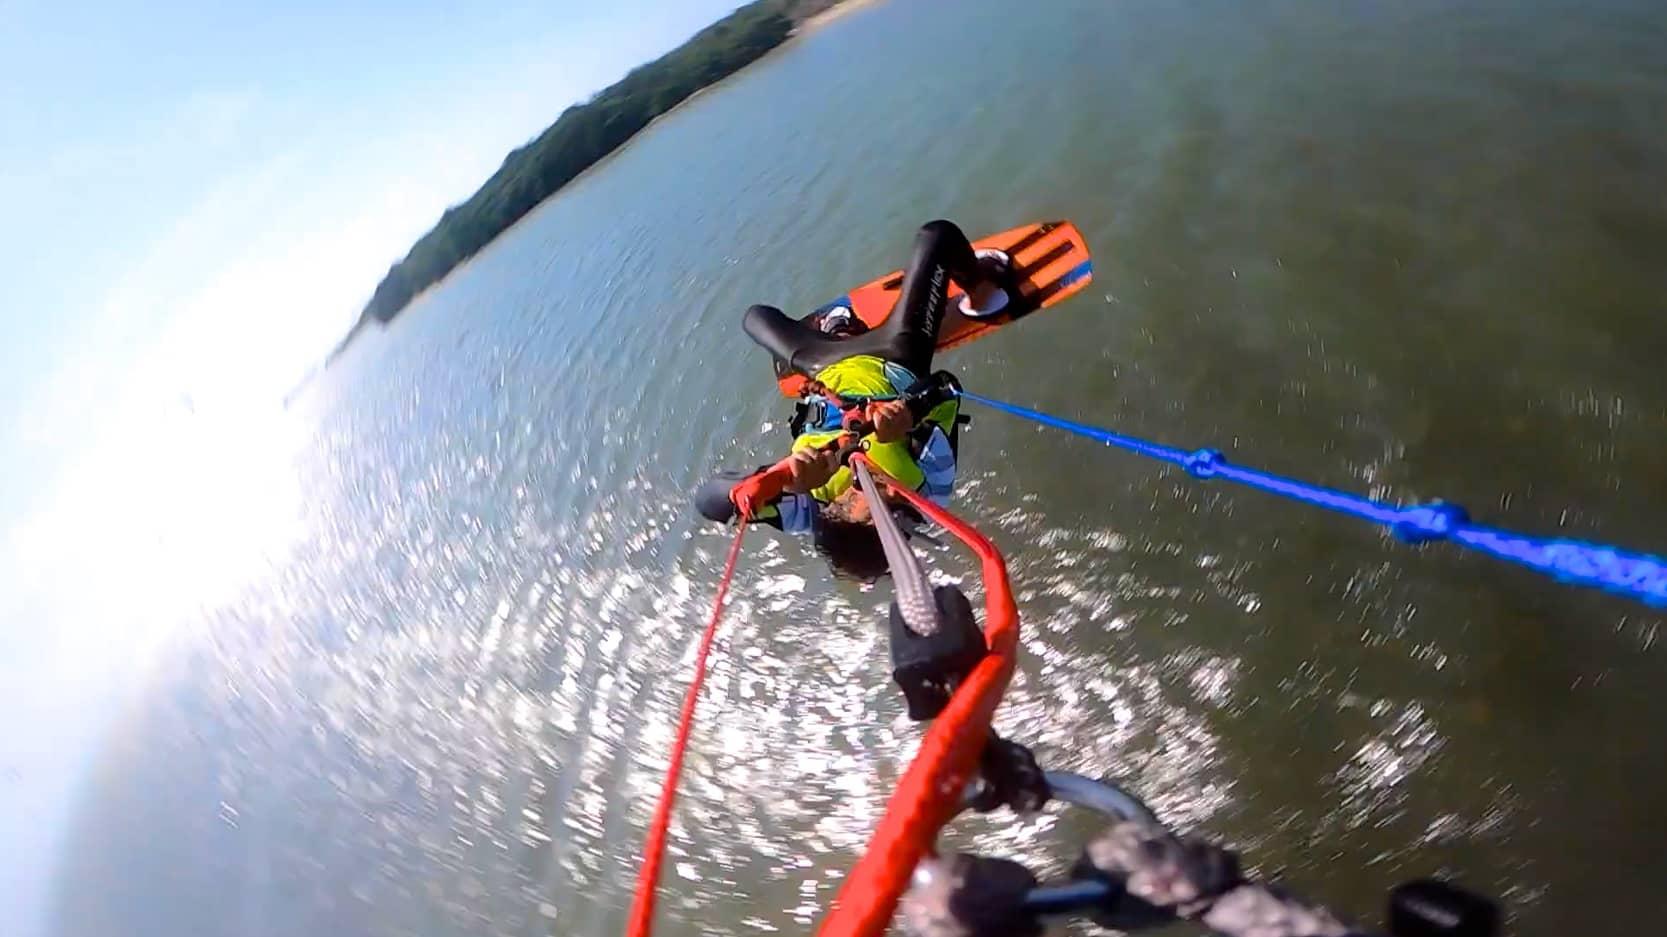 You got it - with Epic Kites Kiteboarding